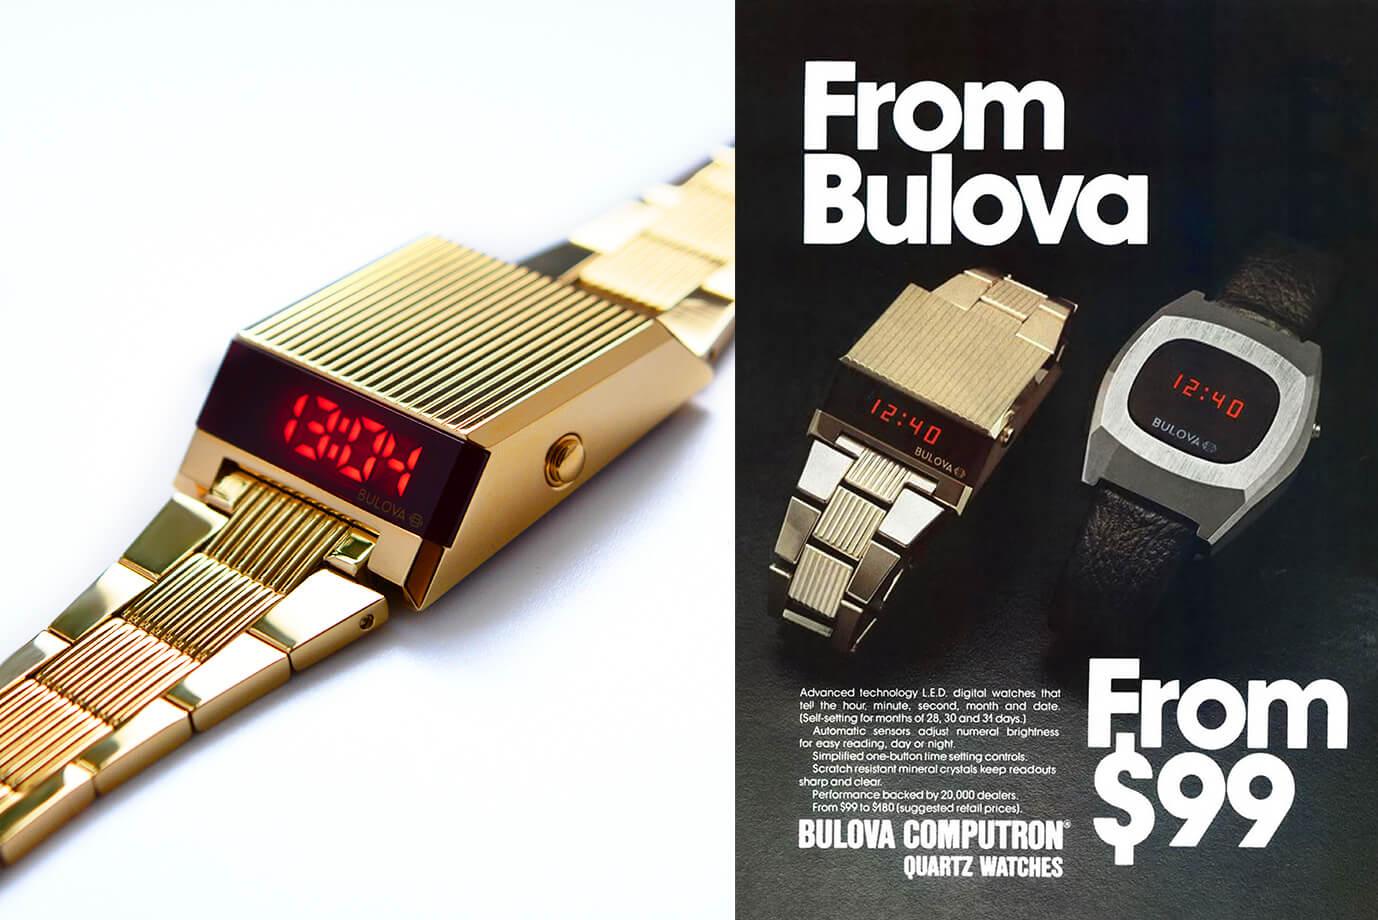 Bulova Computron